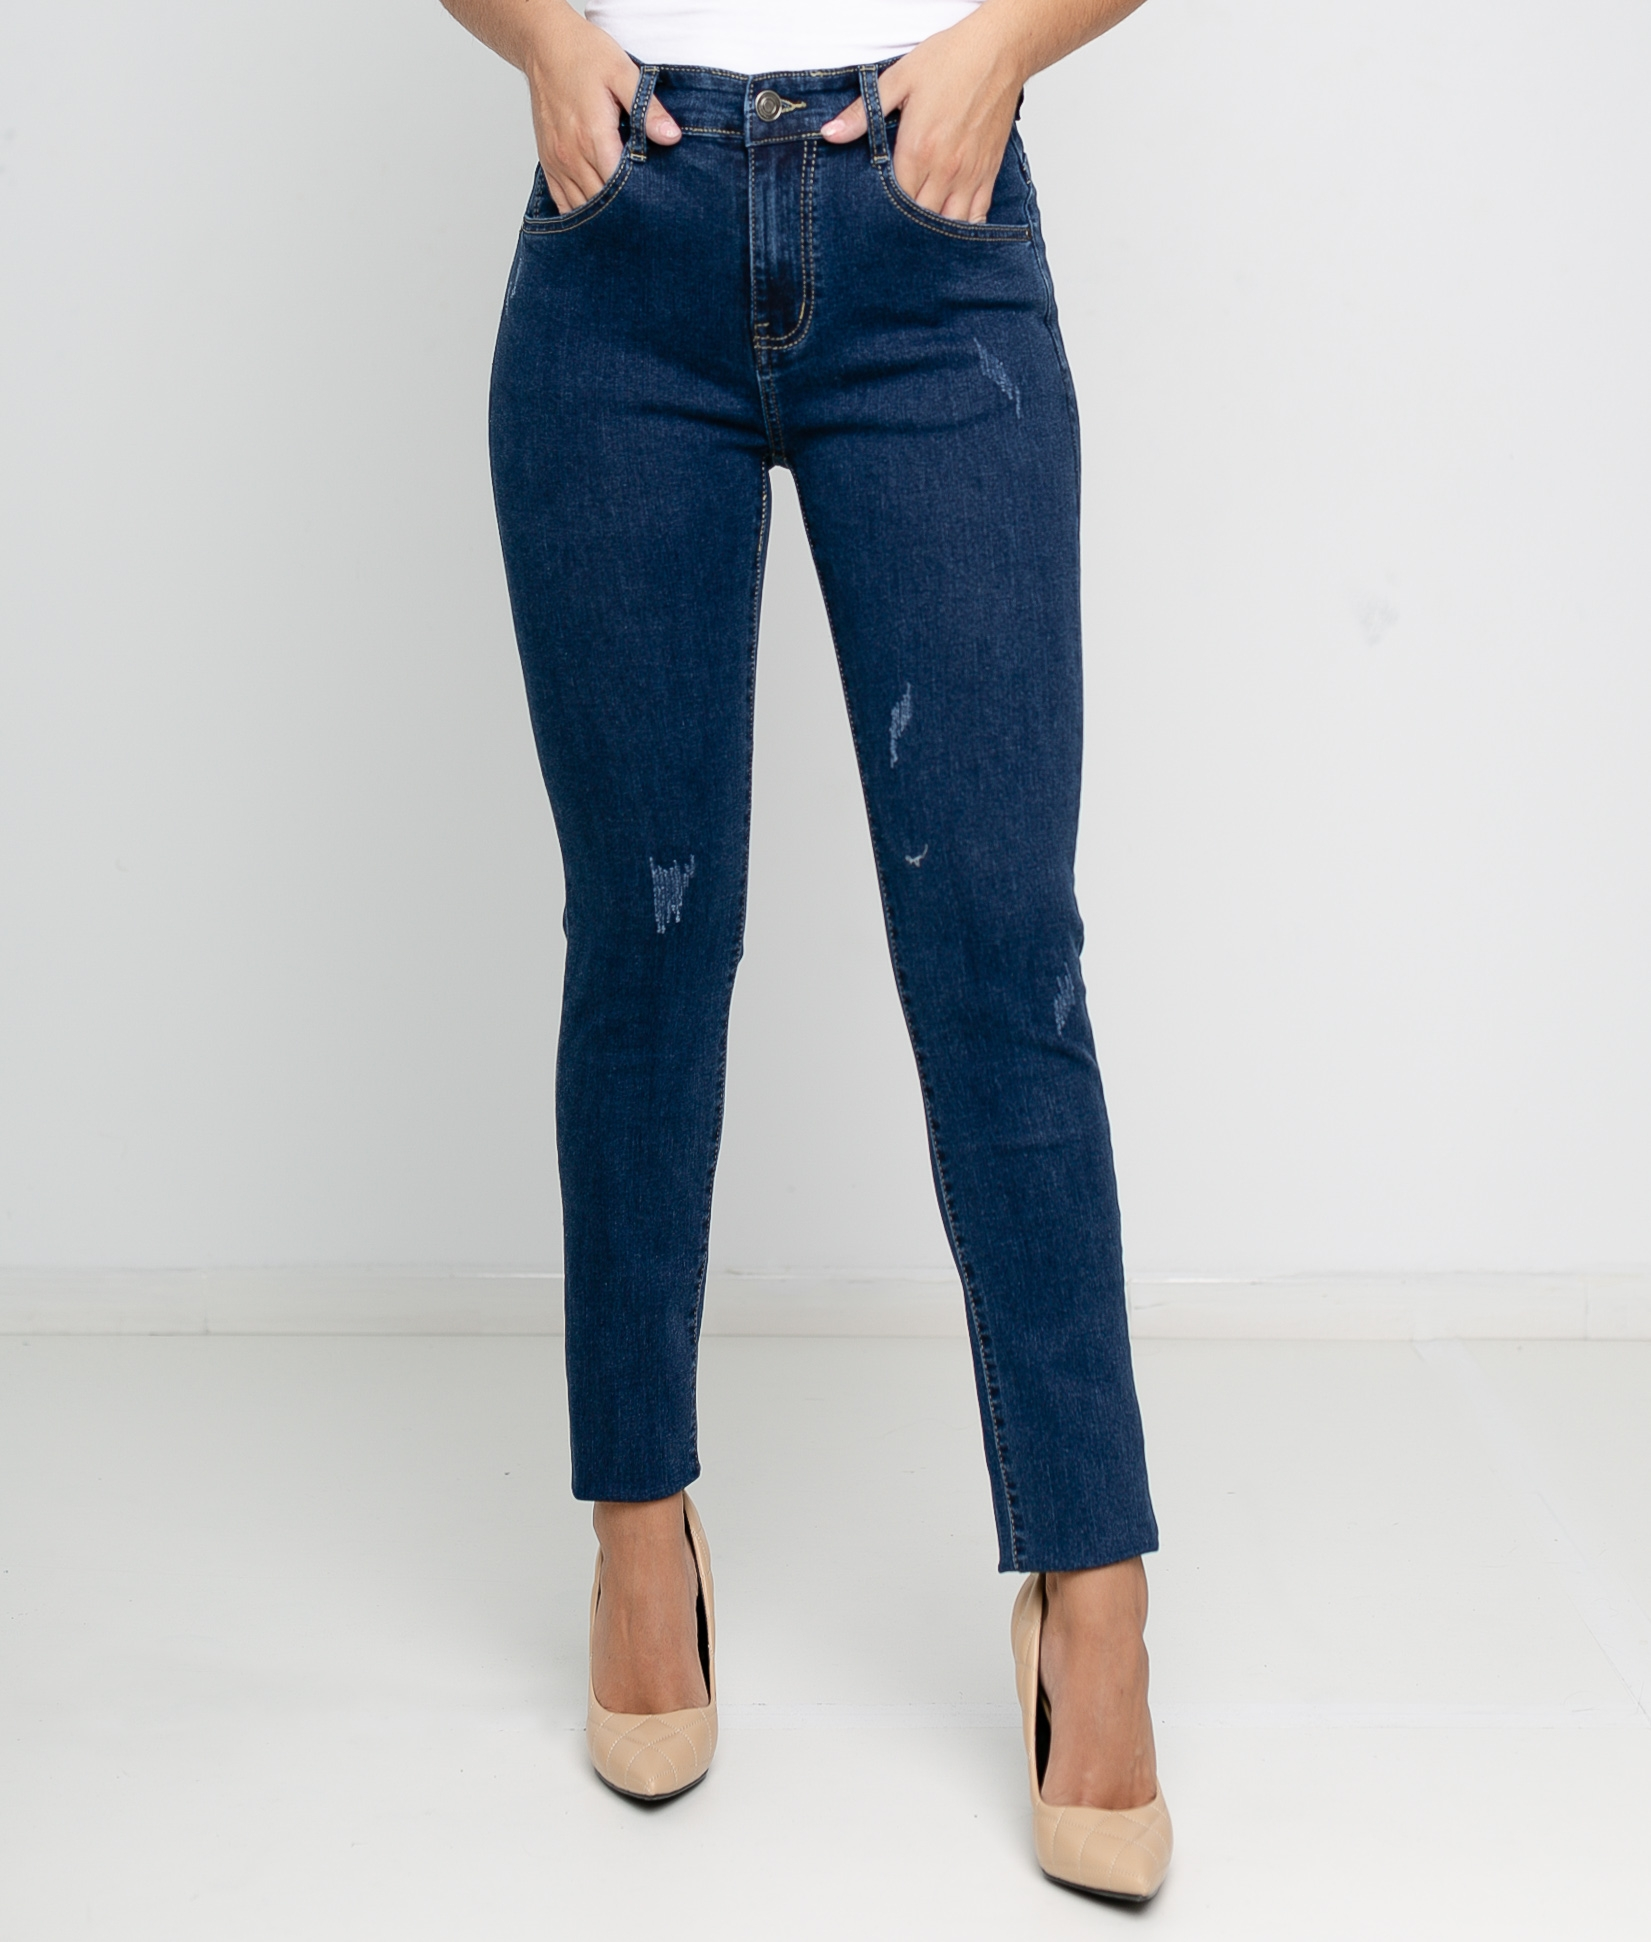 Anoli trousers - Dark denim